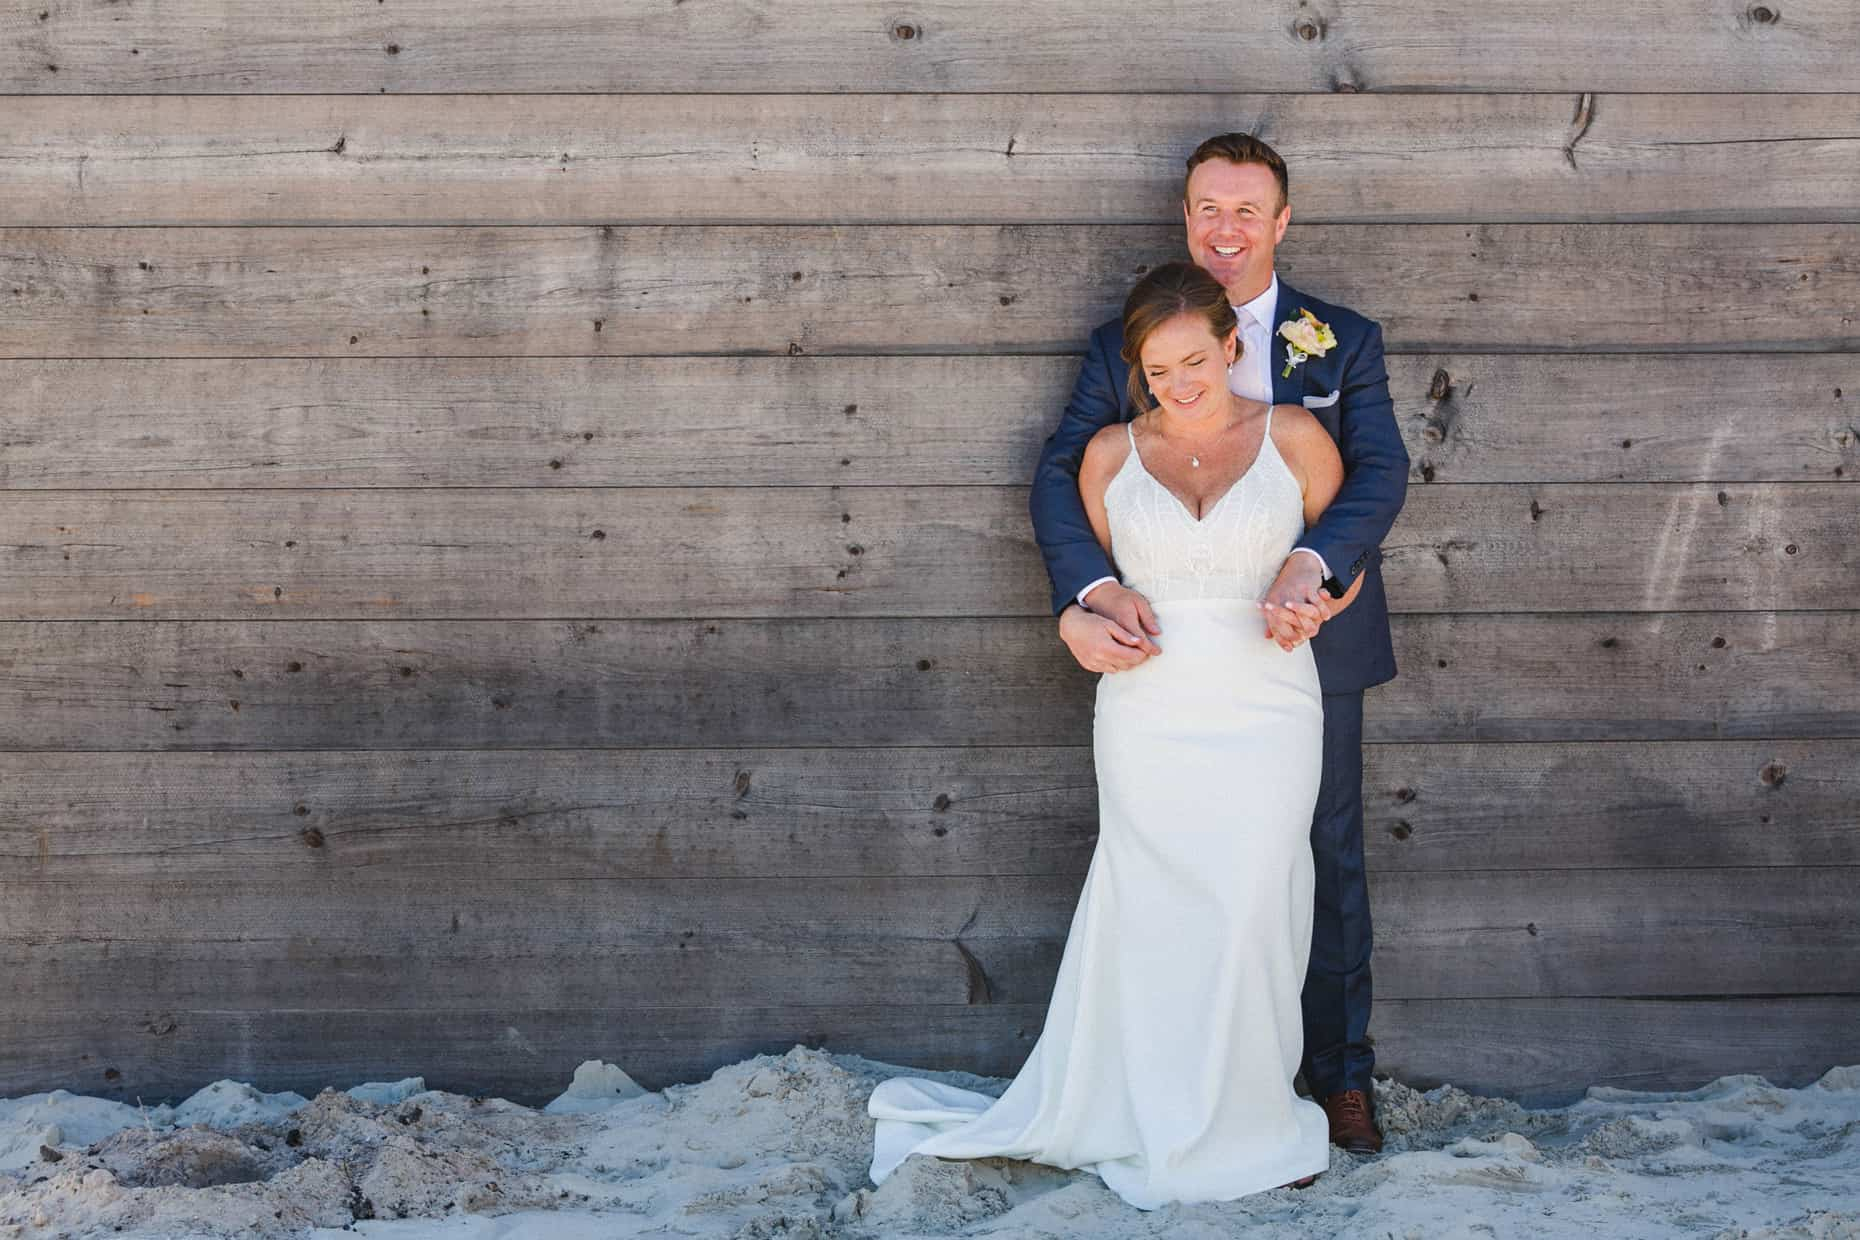 Icona Wedding Photos